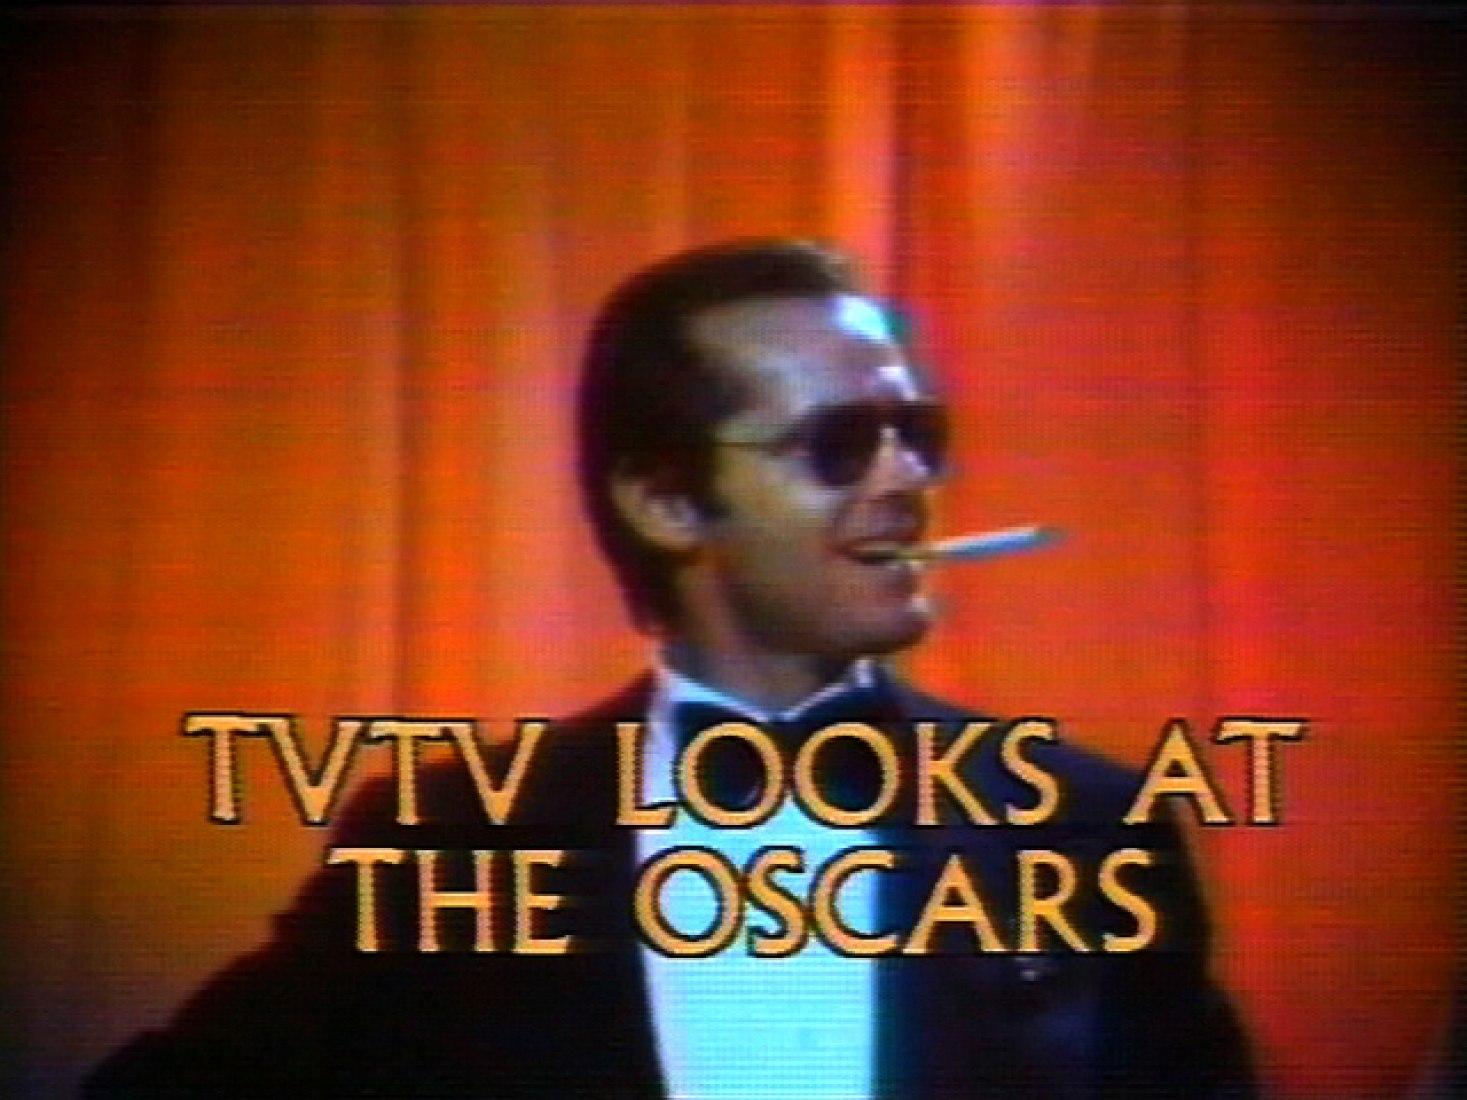 TVTV Looks at the Oscars, 1976. Courtesy Electronic Arts Intermix (EAI), New York.